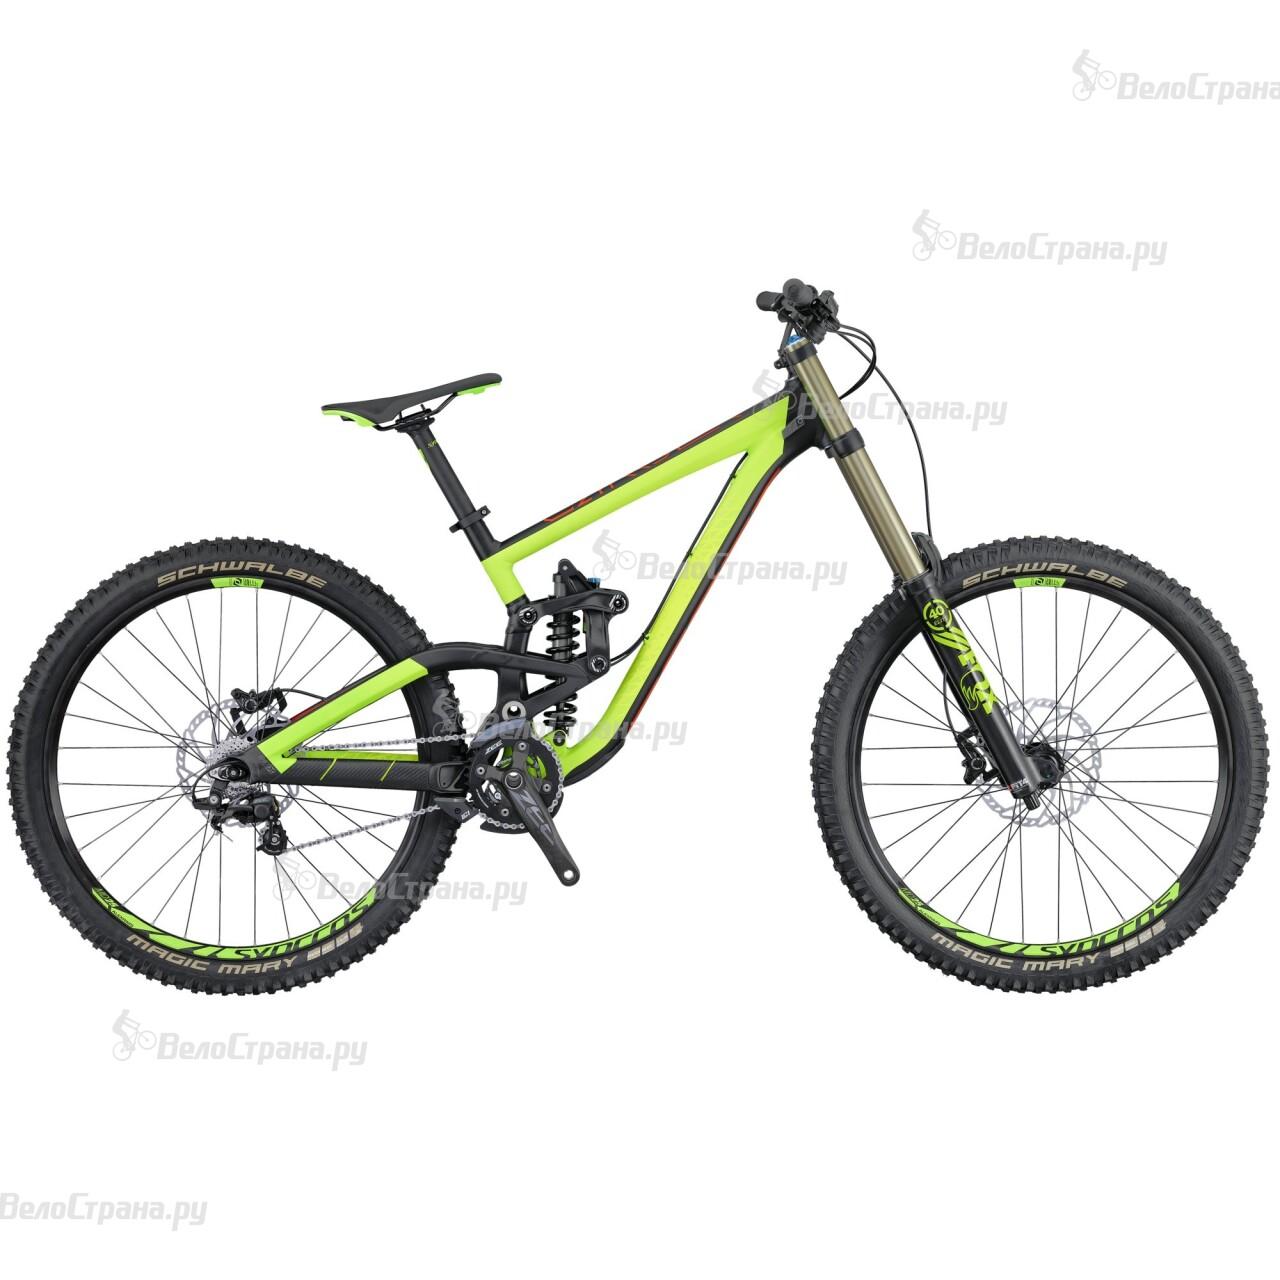 Велосипед Scott GAMBLER 720 (2016) велосипед scott gambler 720 2015